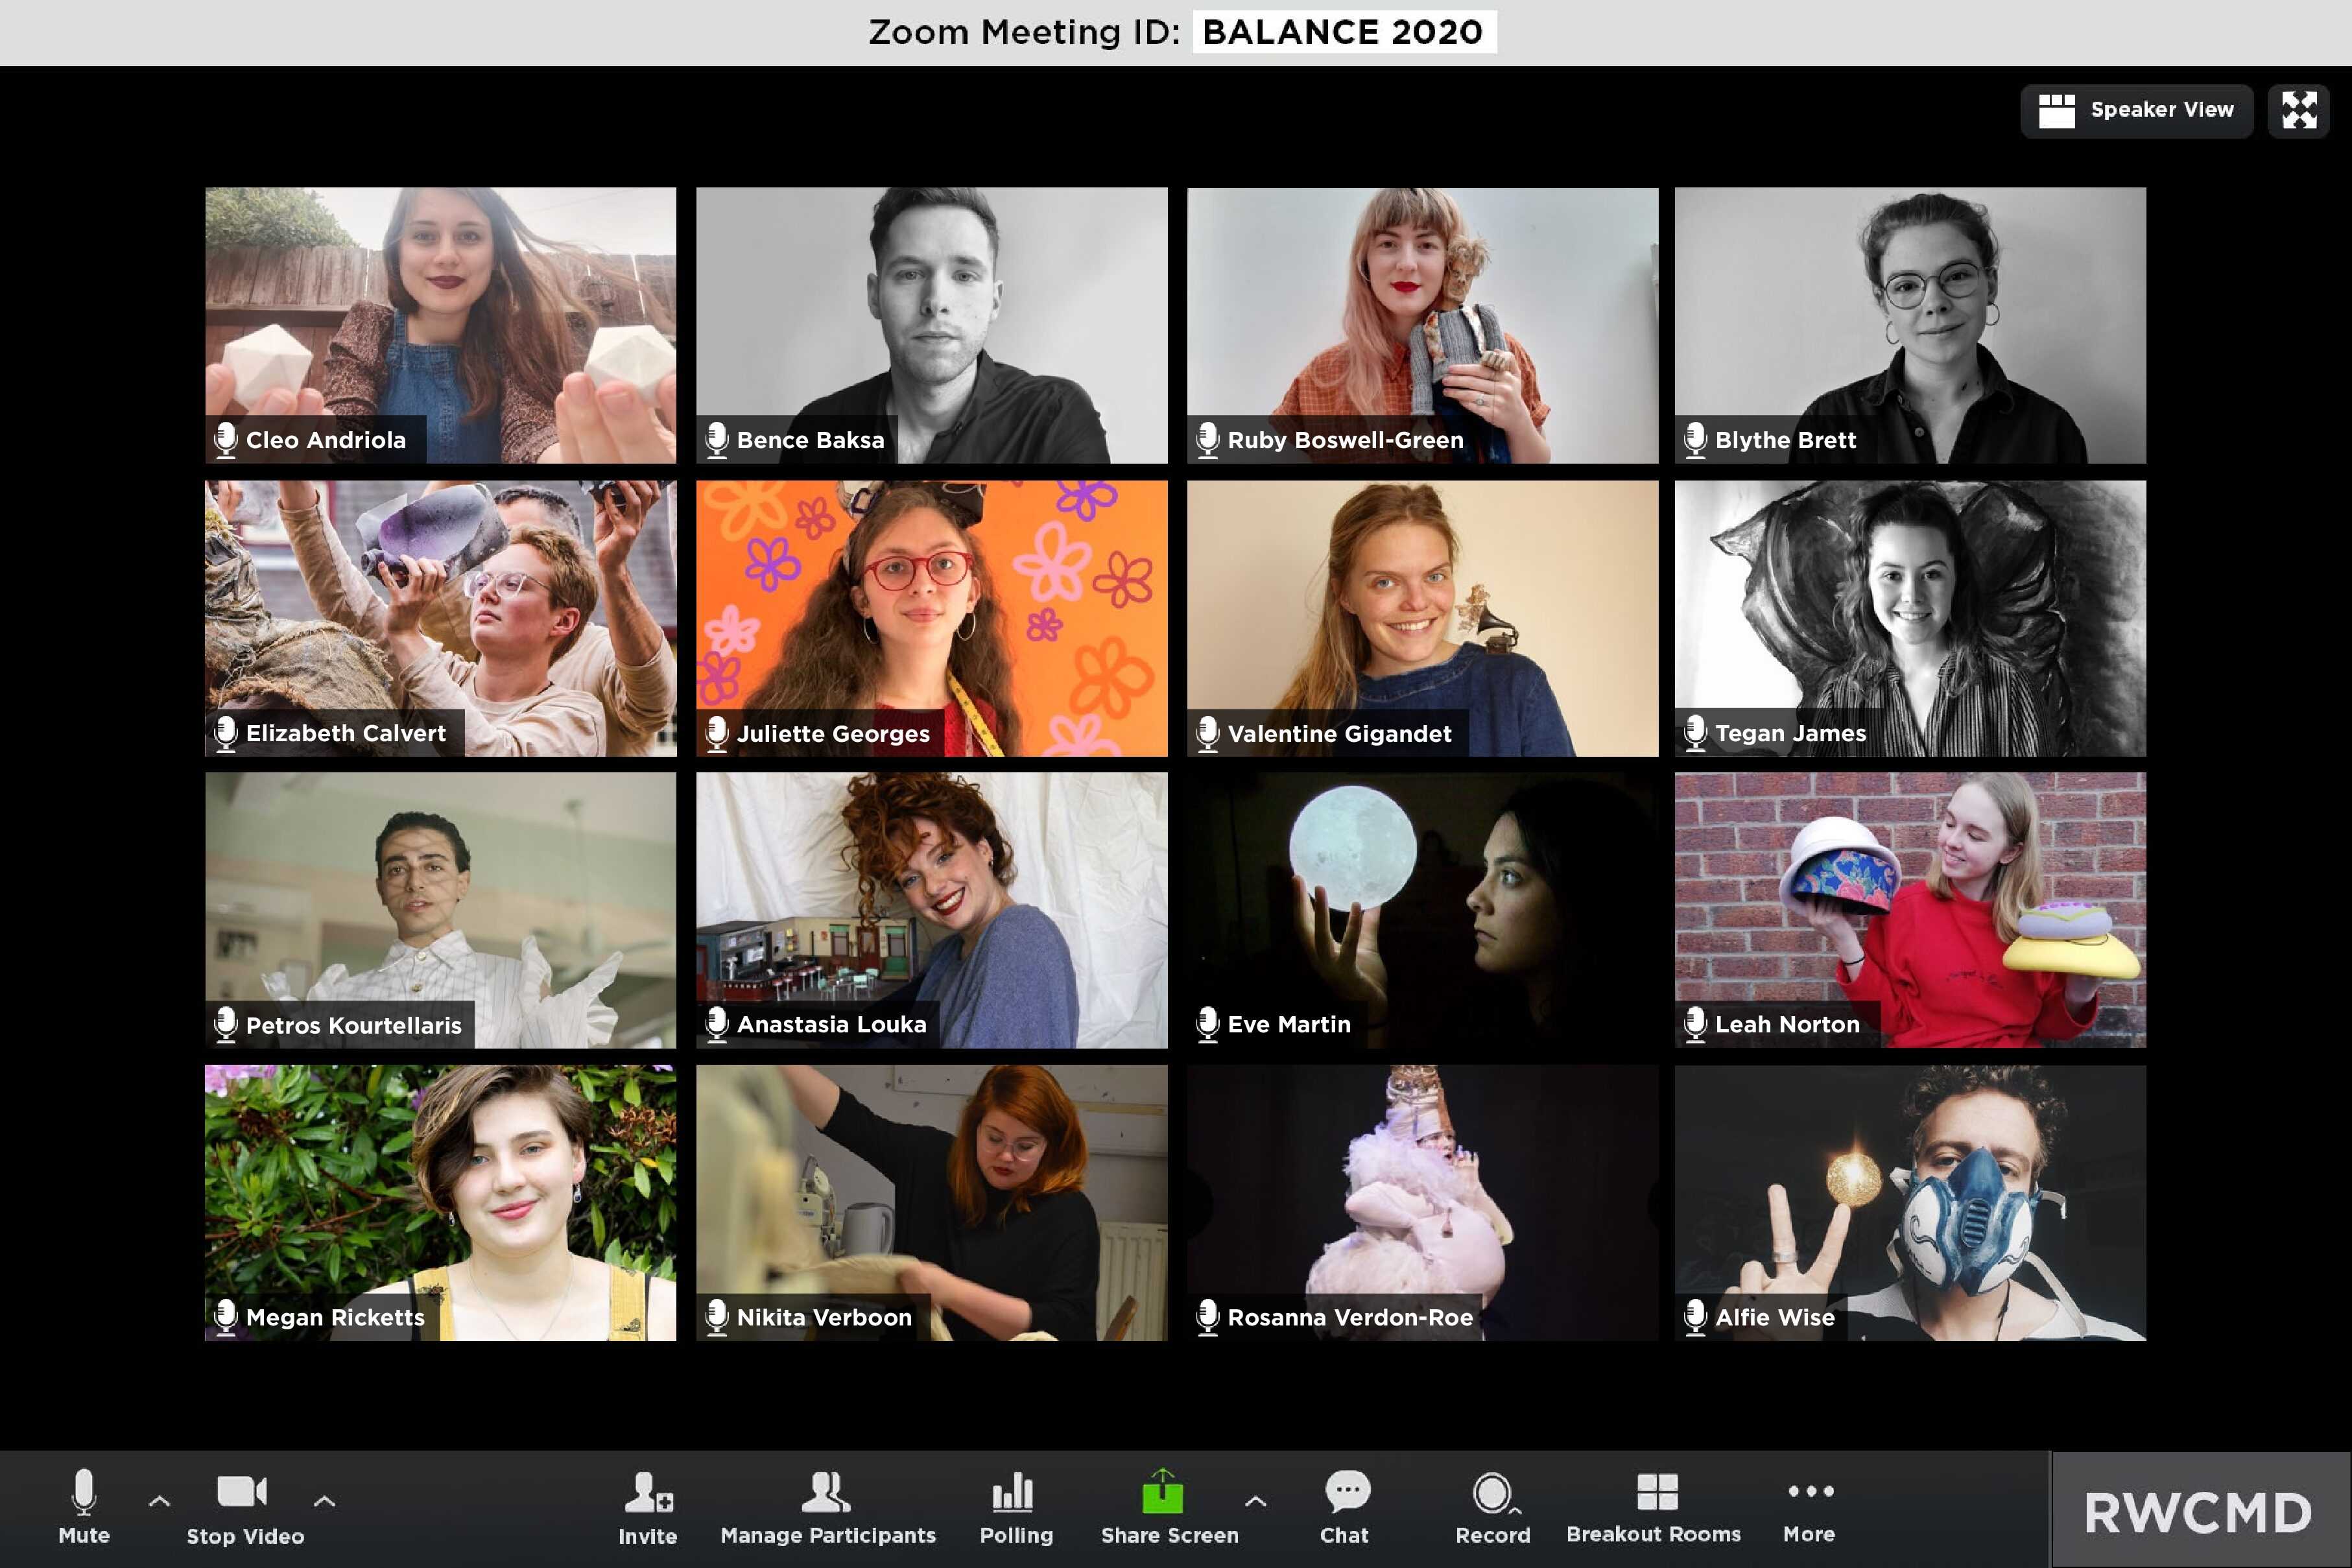 Balance – RWCMD New Graduates 2020